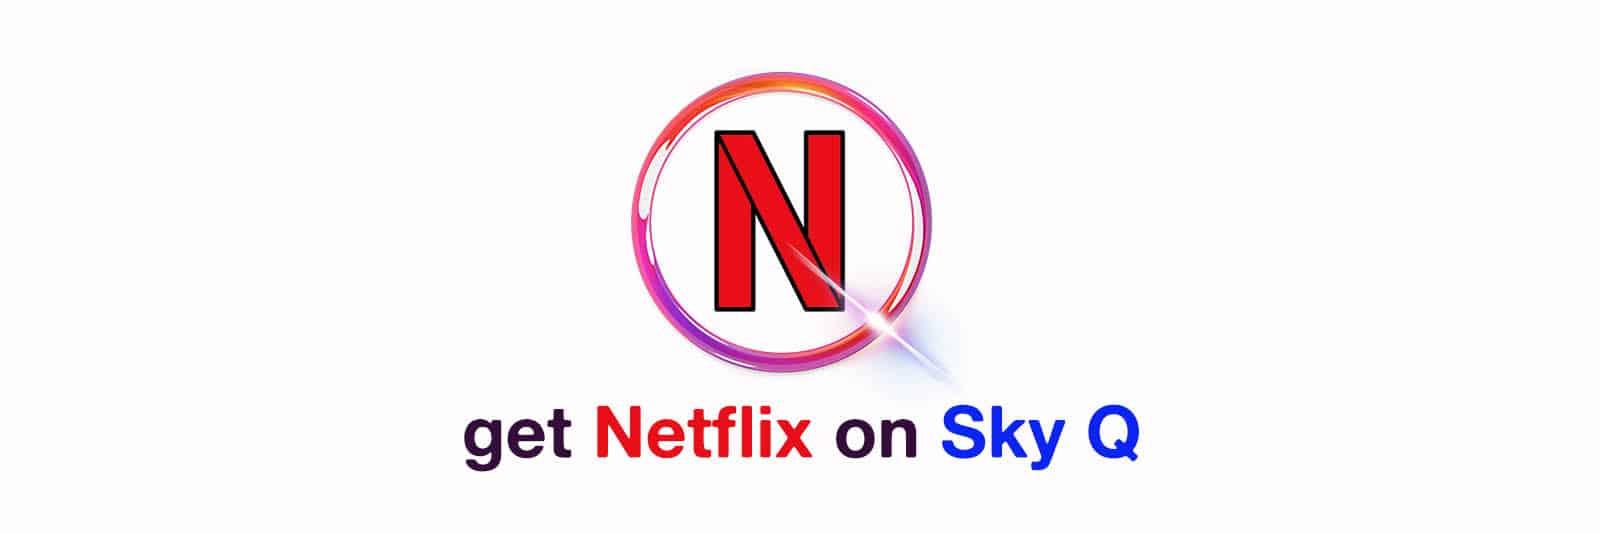 netflix-sky-q